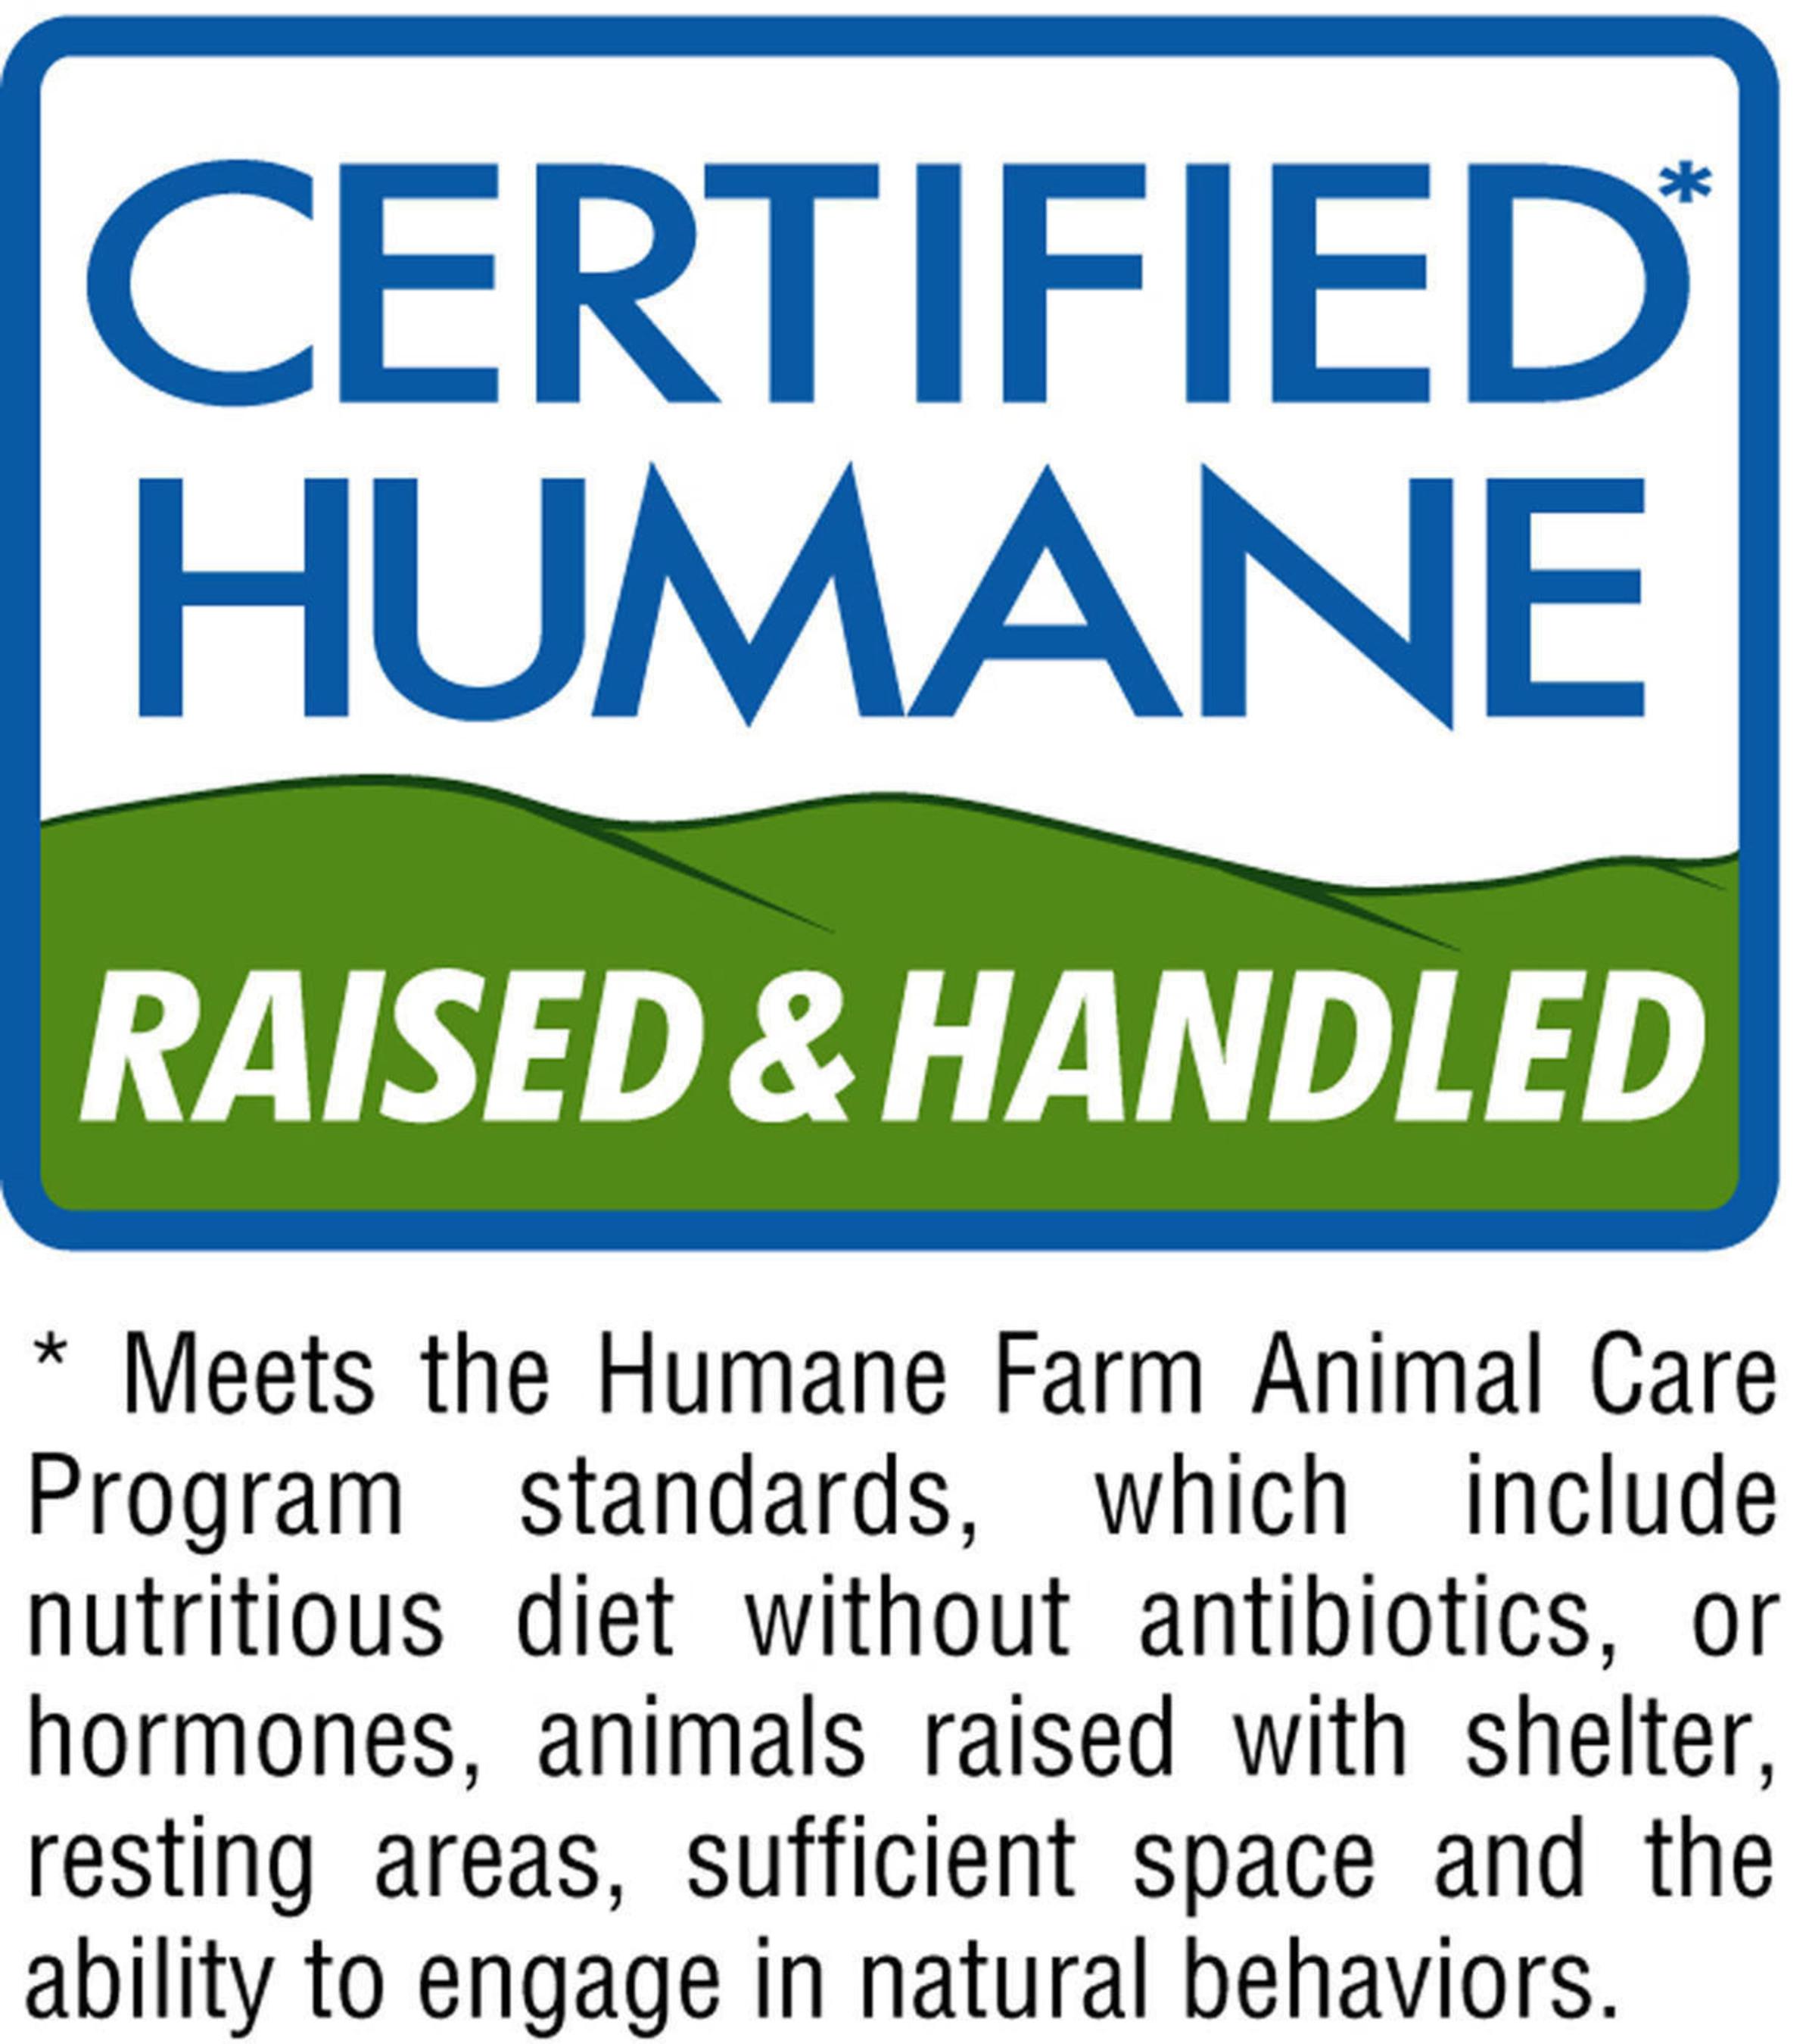 Certified Humane.